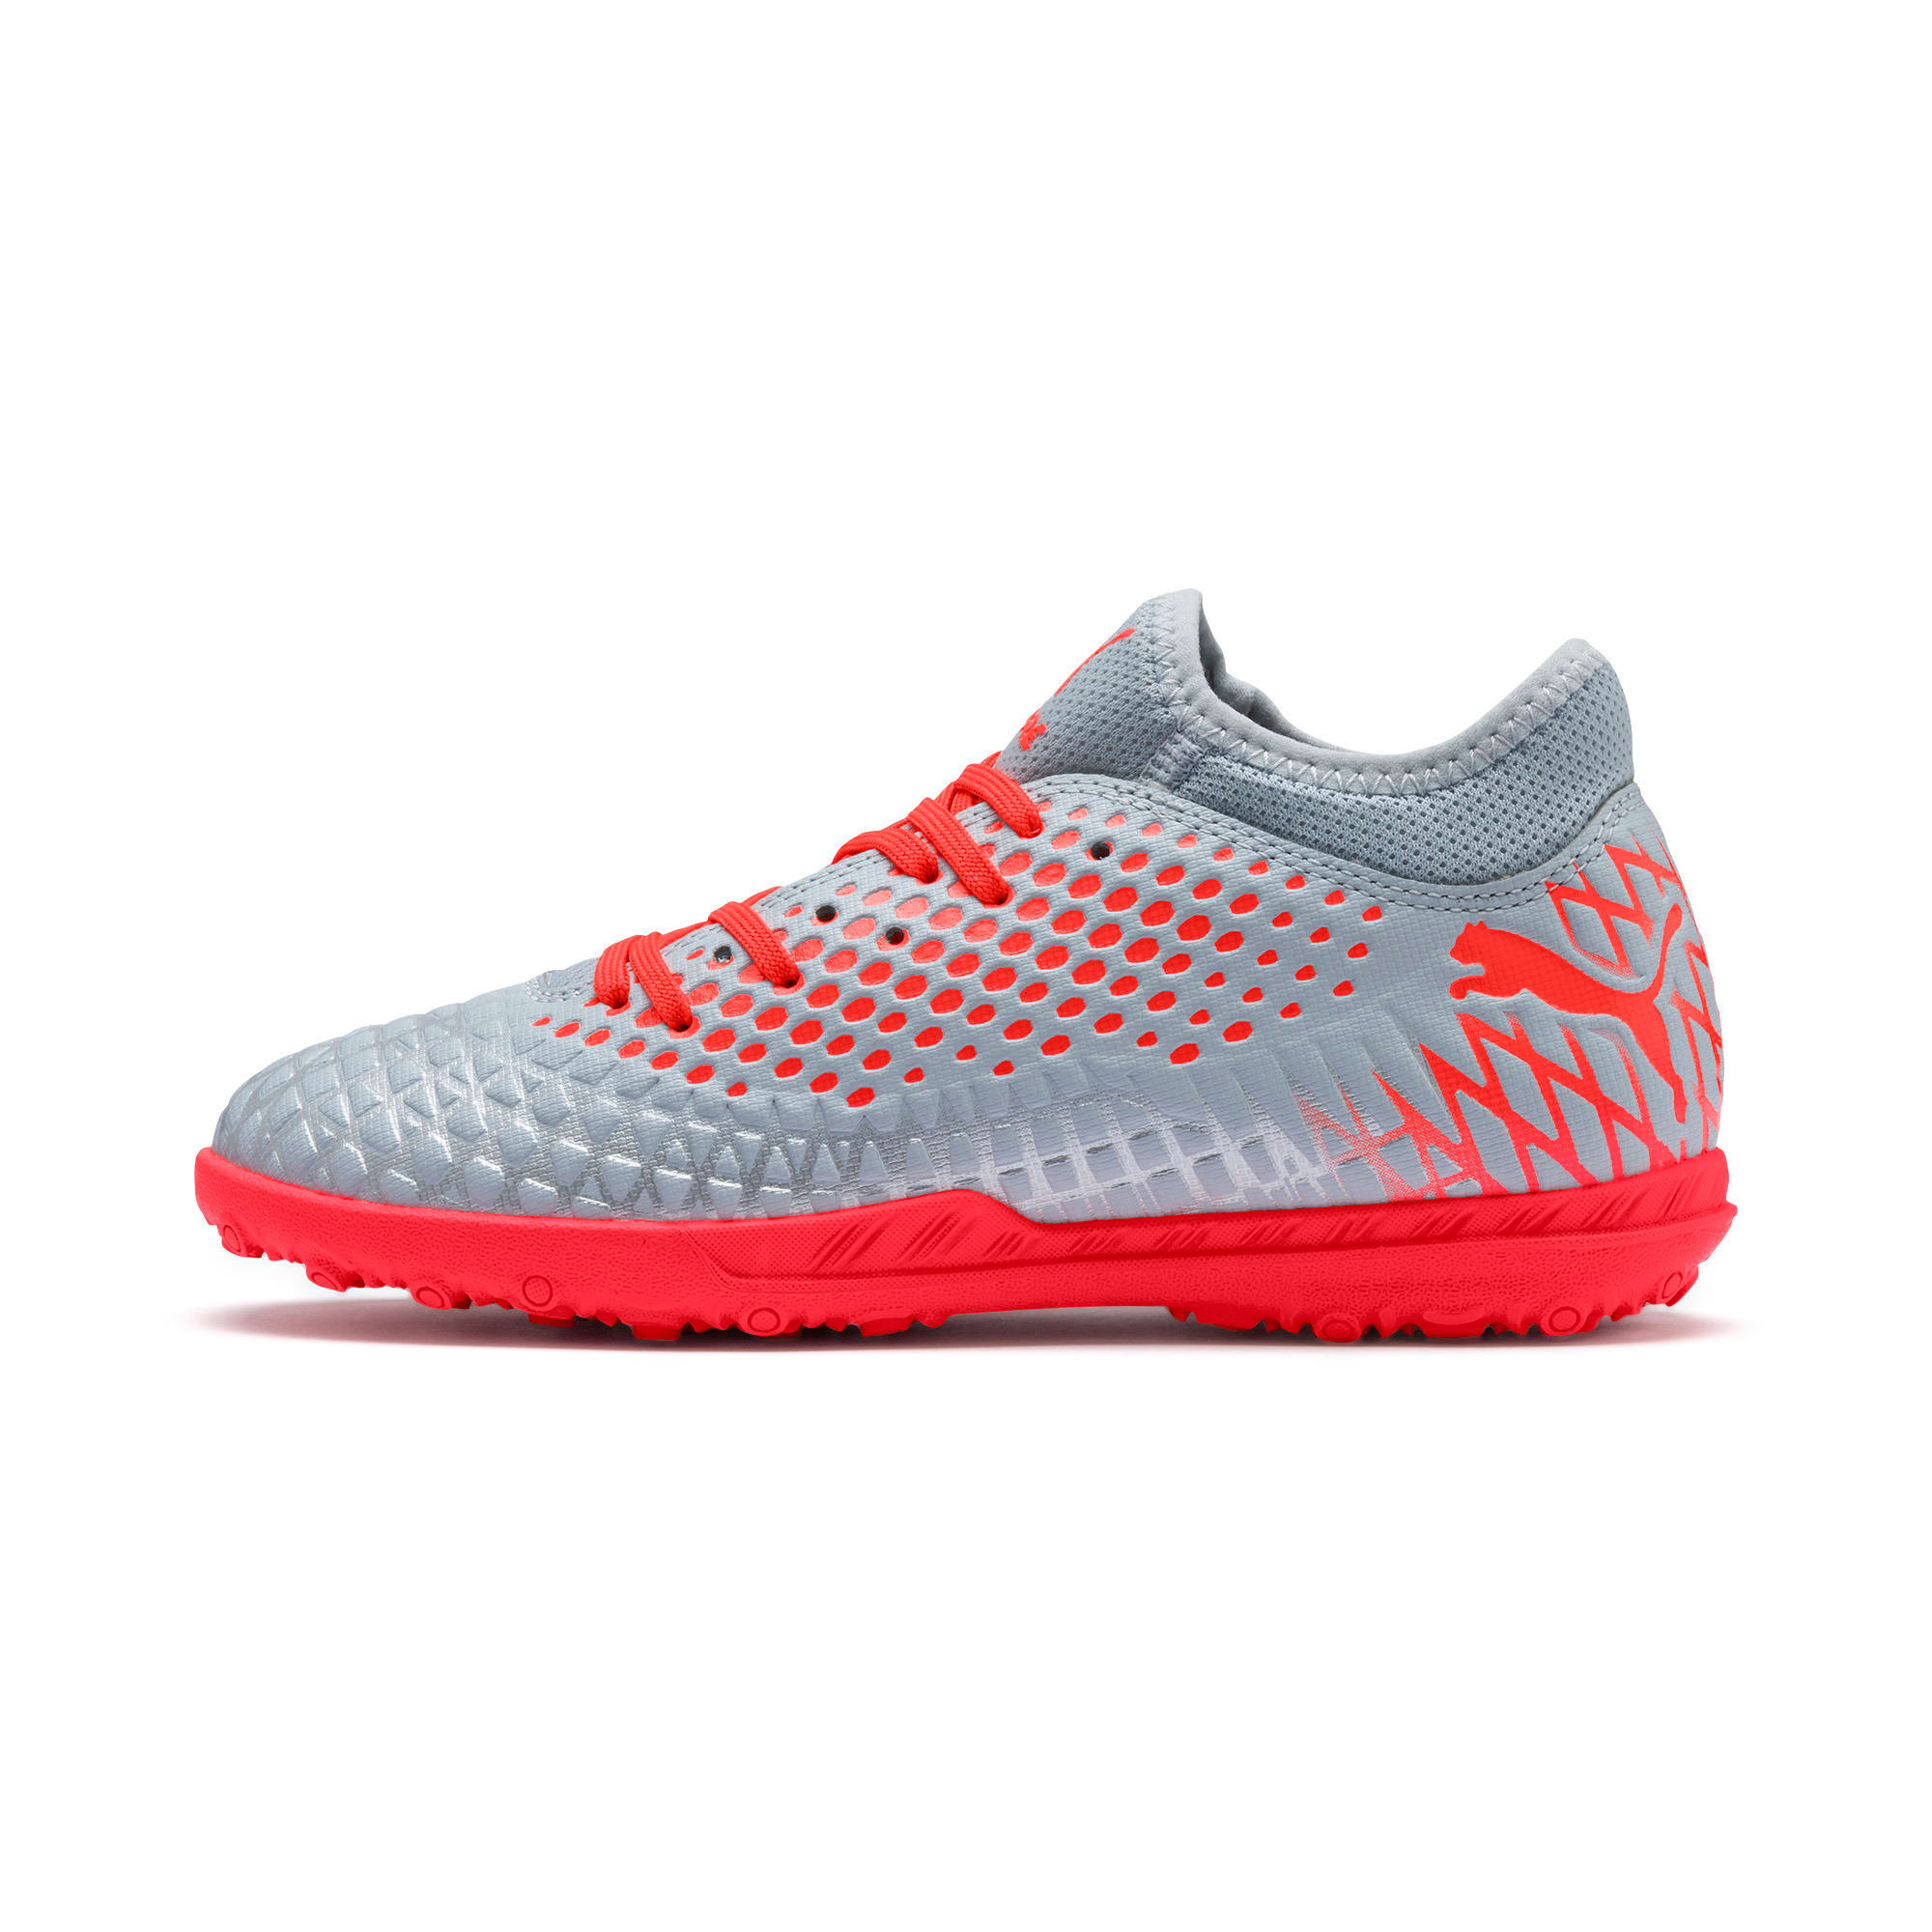 Thumbnail 1 of FUTURE 4.4 TT Soccer Shoes JR, Glacial Blue-Nrgy Red, medium